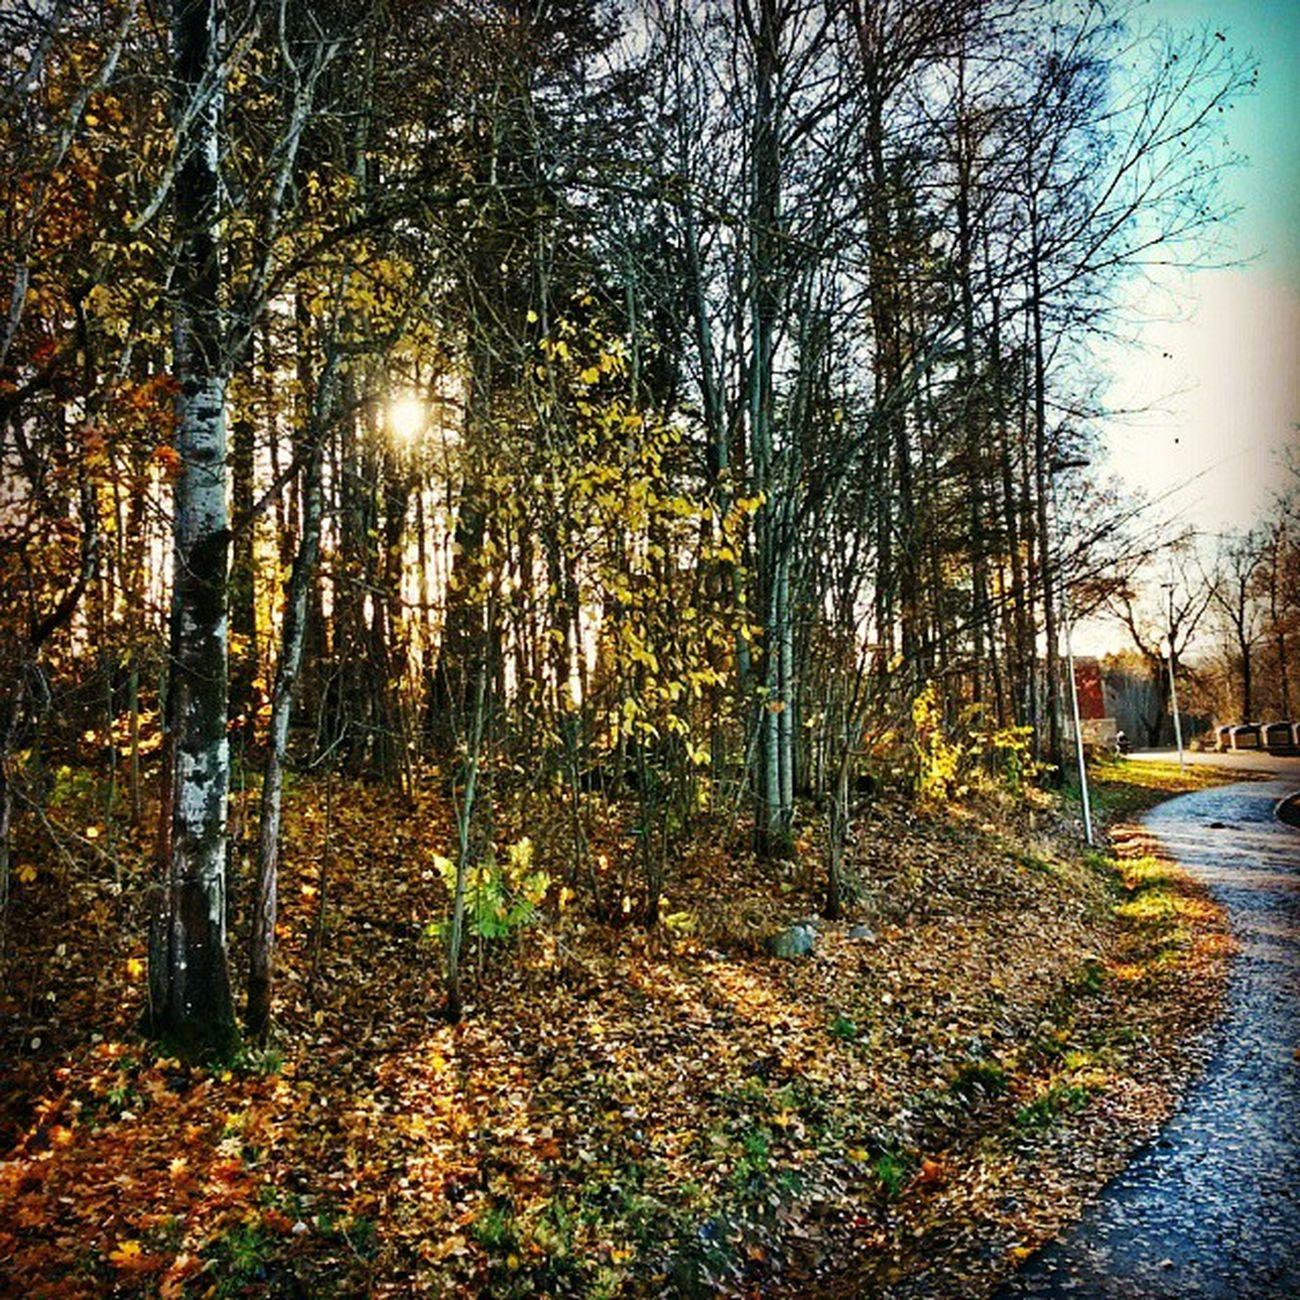 Ilovenorway Ilovenorway_akershus Follo   ås pentagon umb worldunion wu_norway autumn høst hdr ic_trees ig_week_autumn ig_week